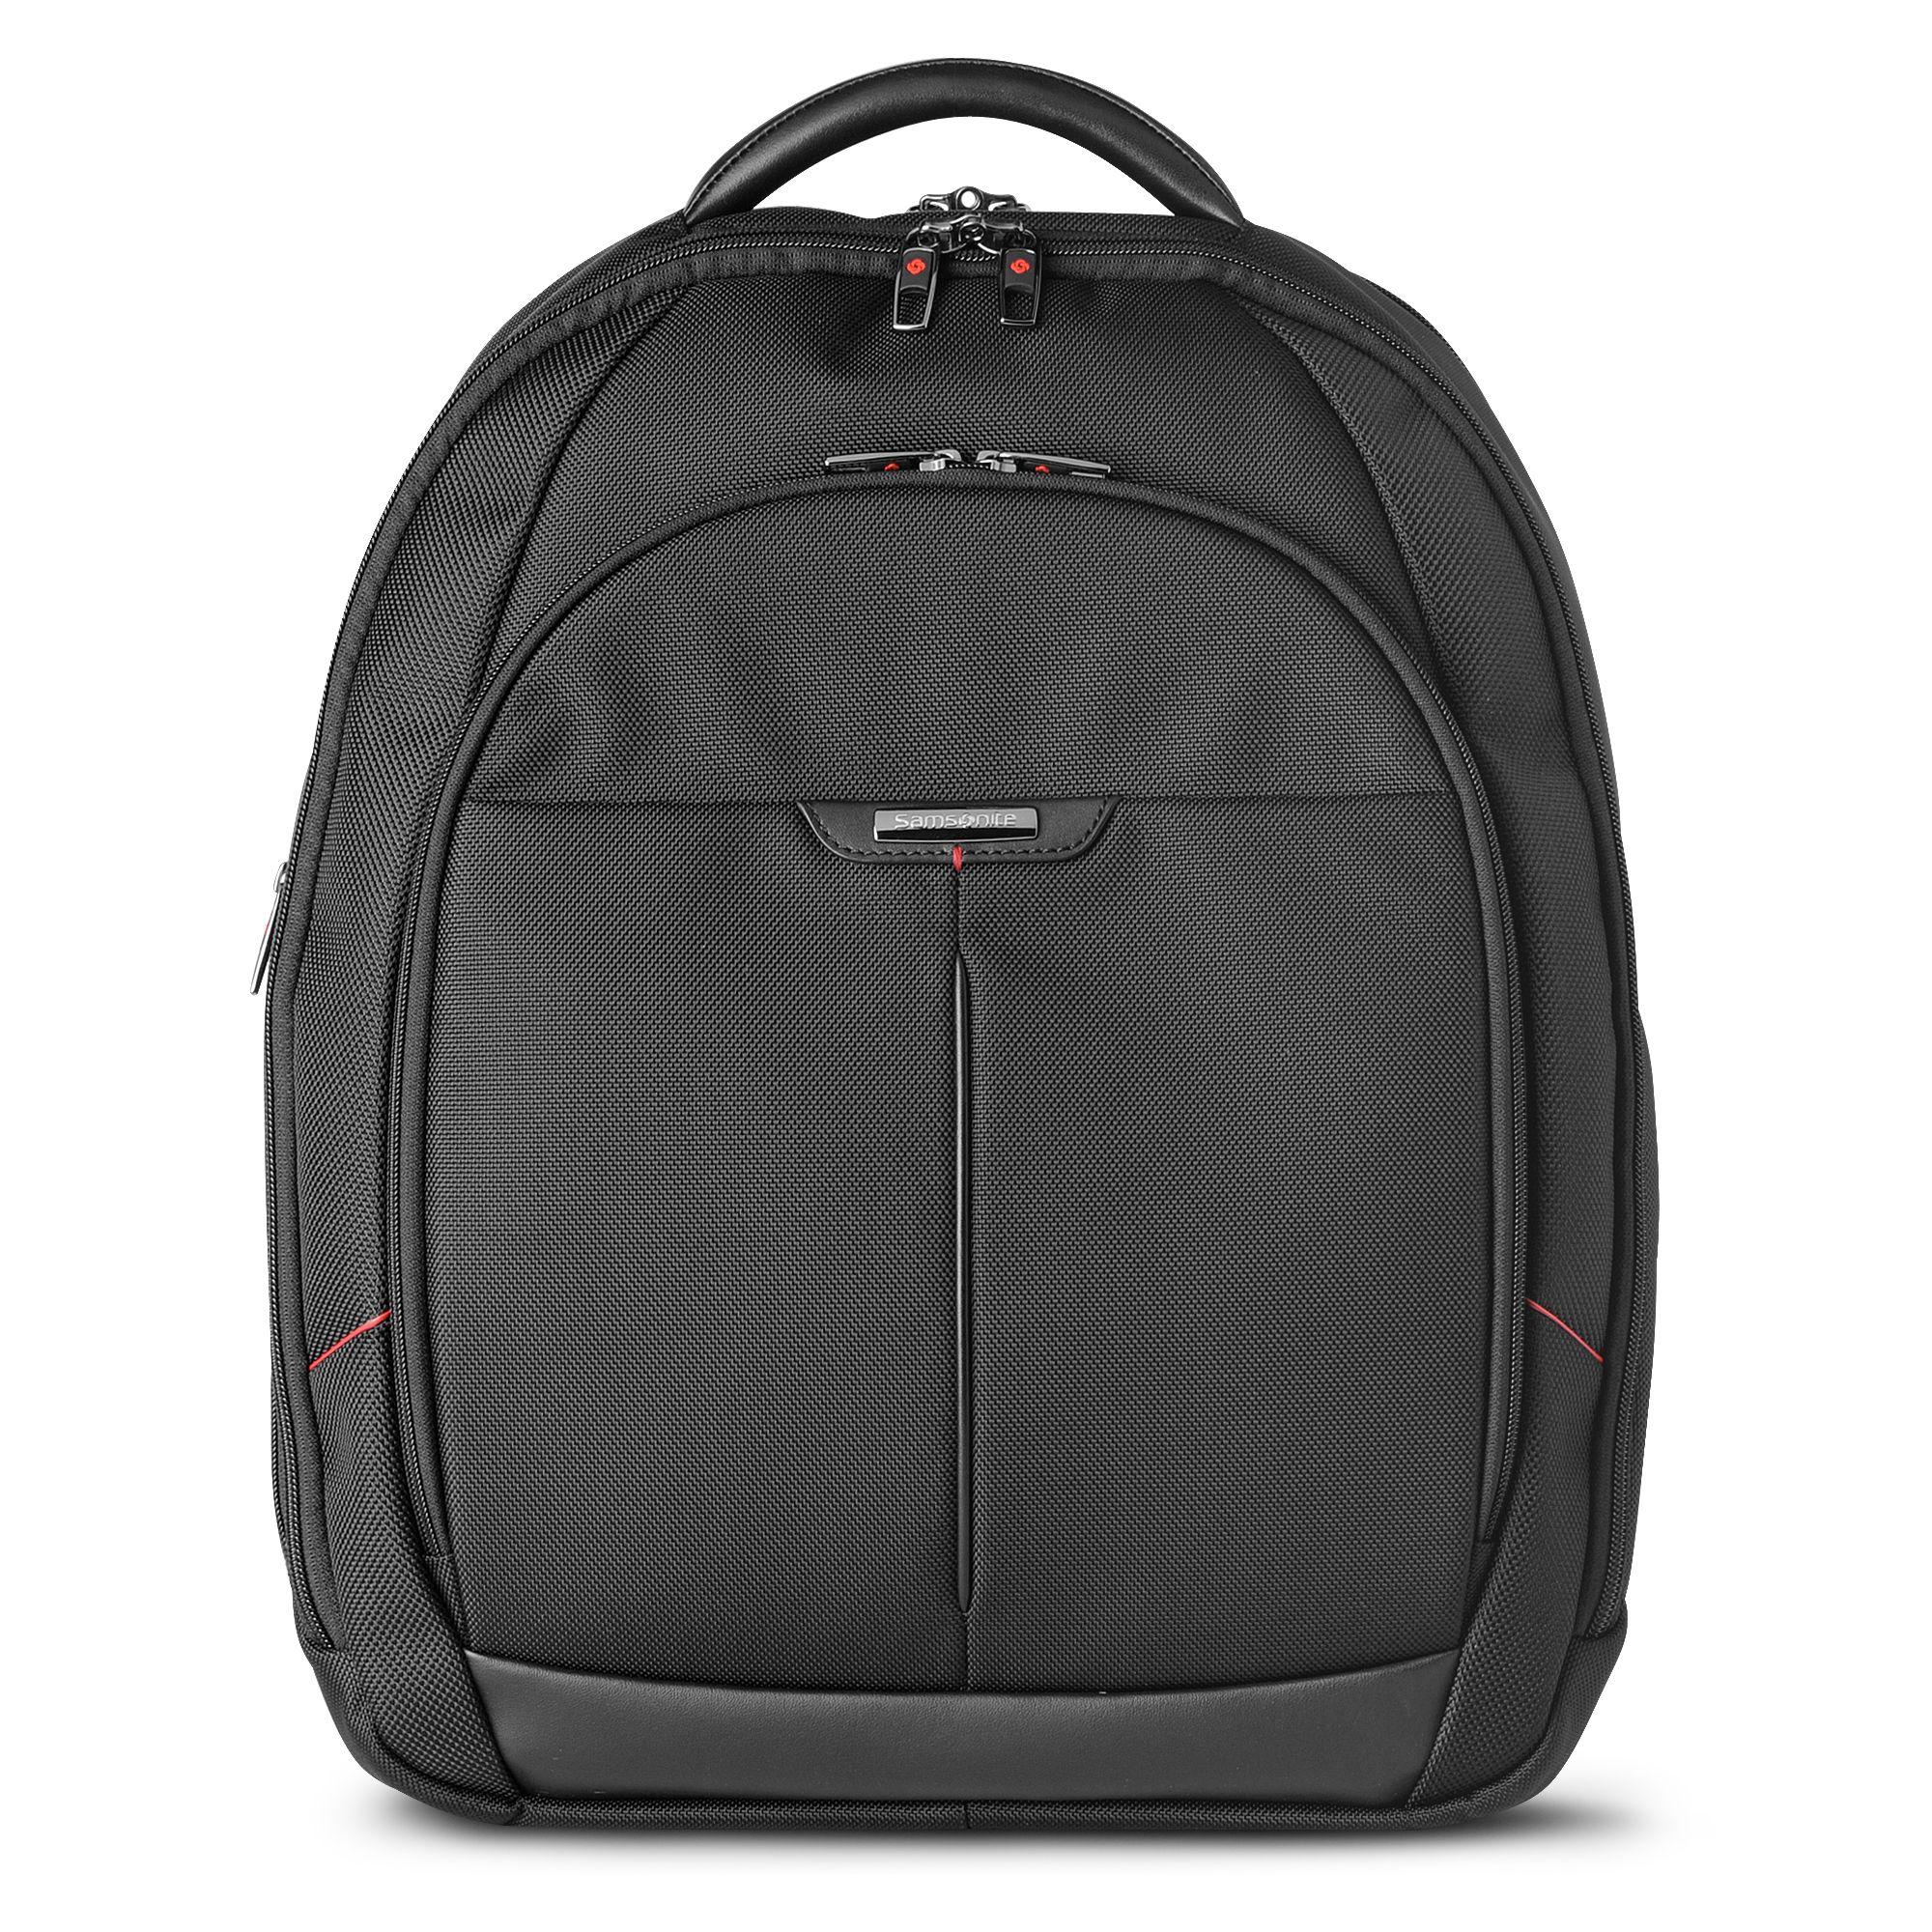 Samsonite Prou2013dlx3 Laptop Backpack In Black For Men | Lyst